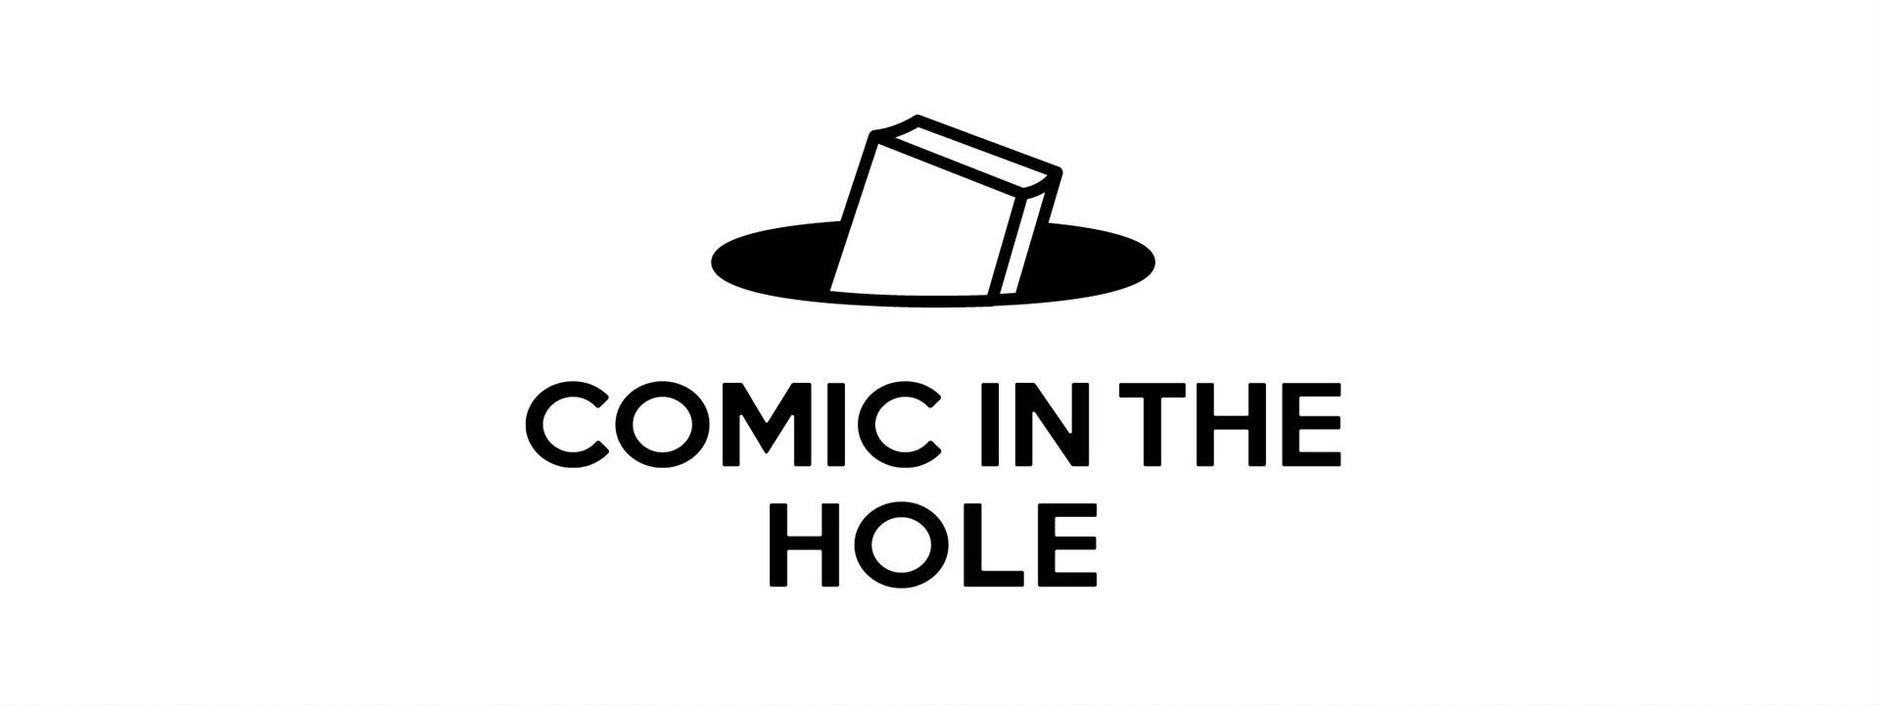 通信販売 | COMIC IN THE HOLE | 漫画